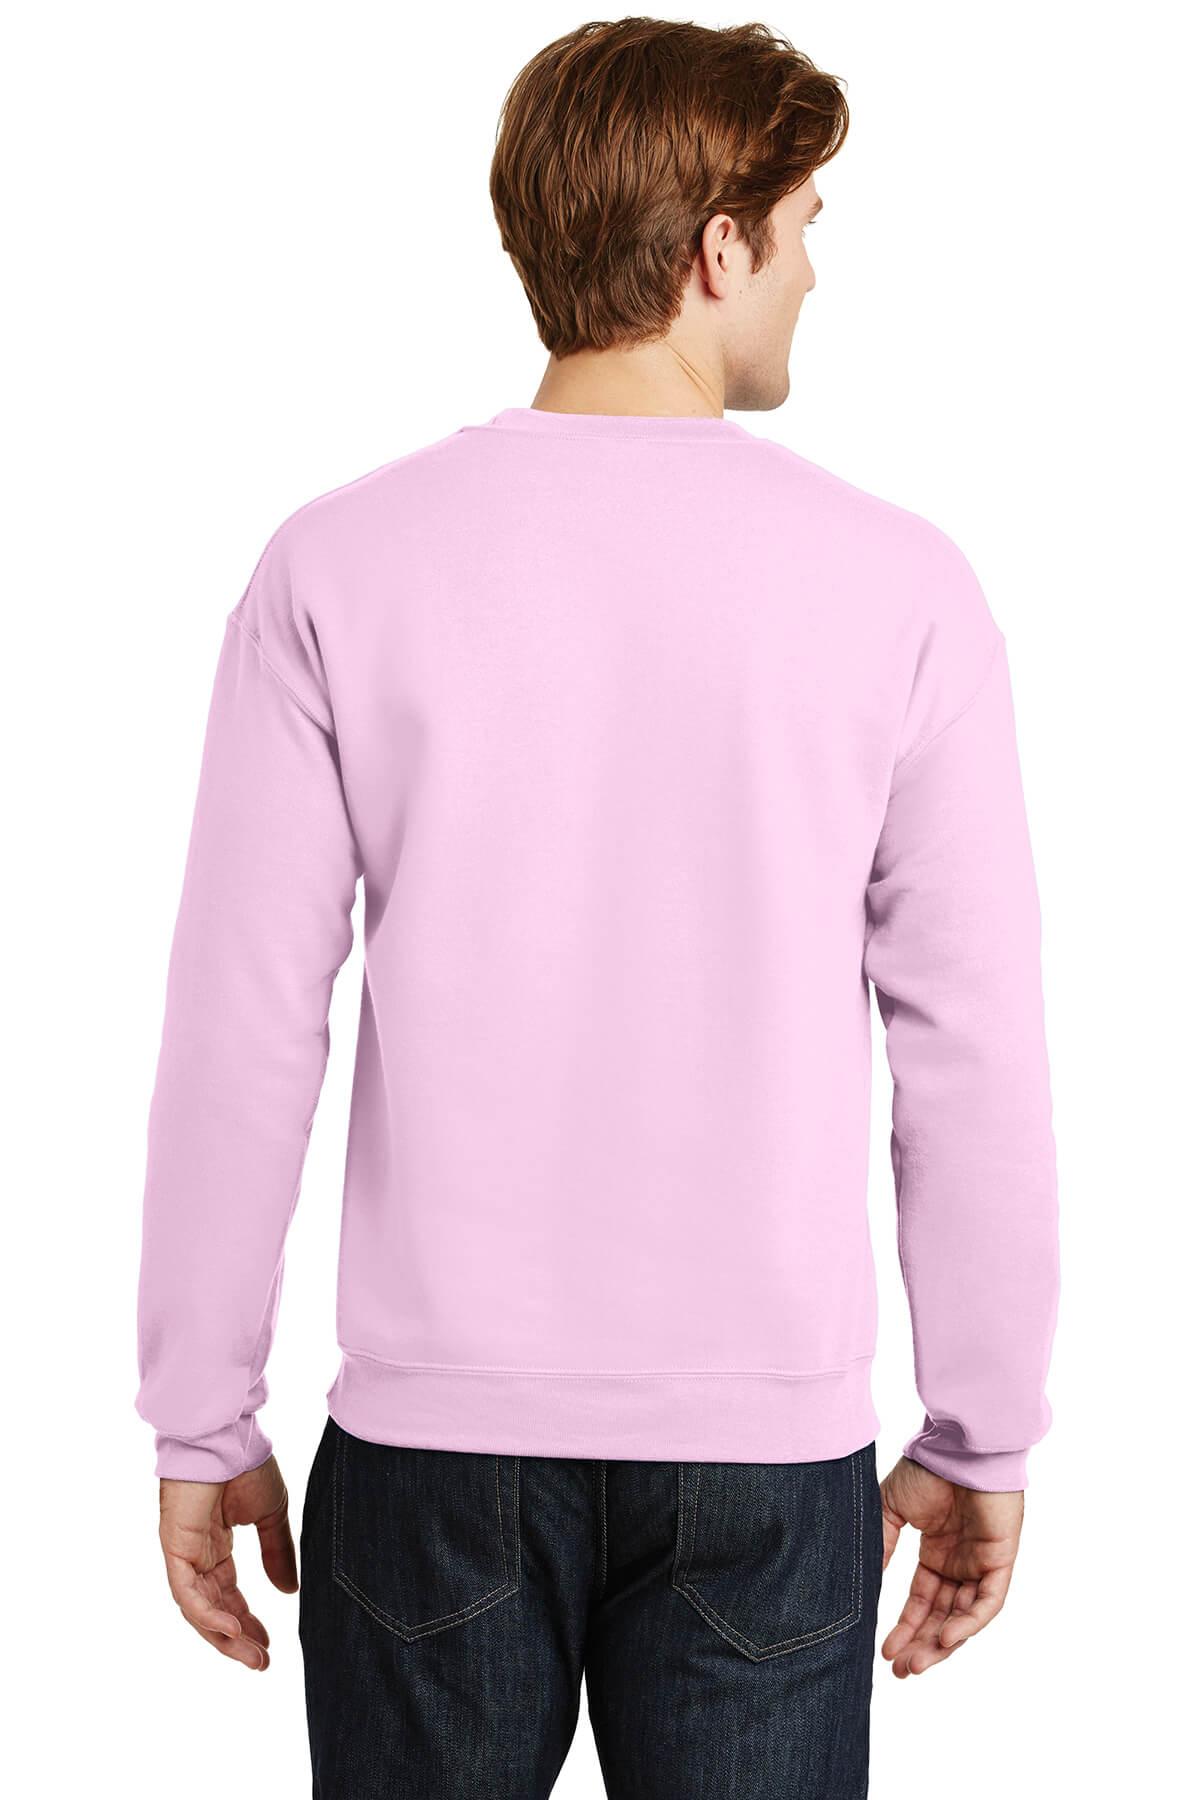 18000-light-pink-2